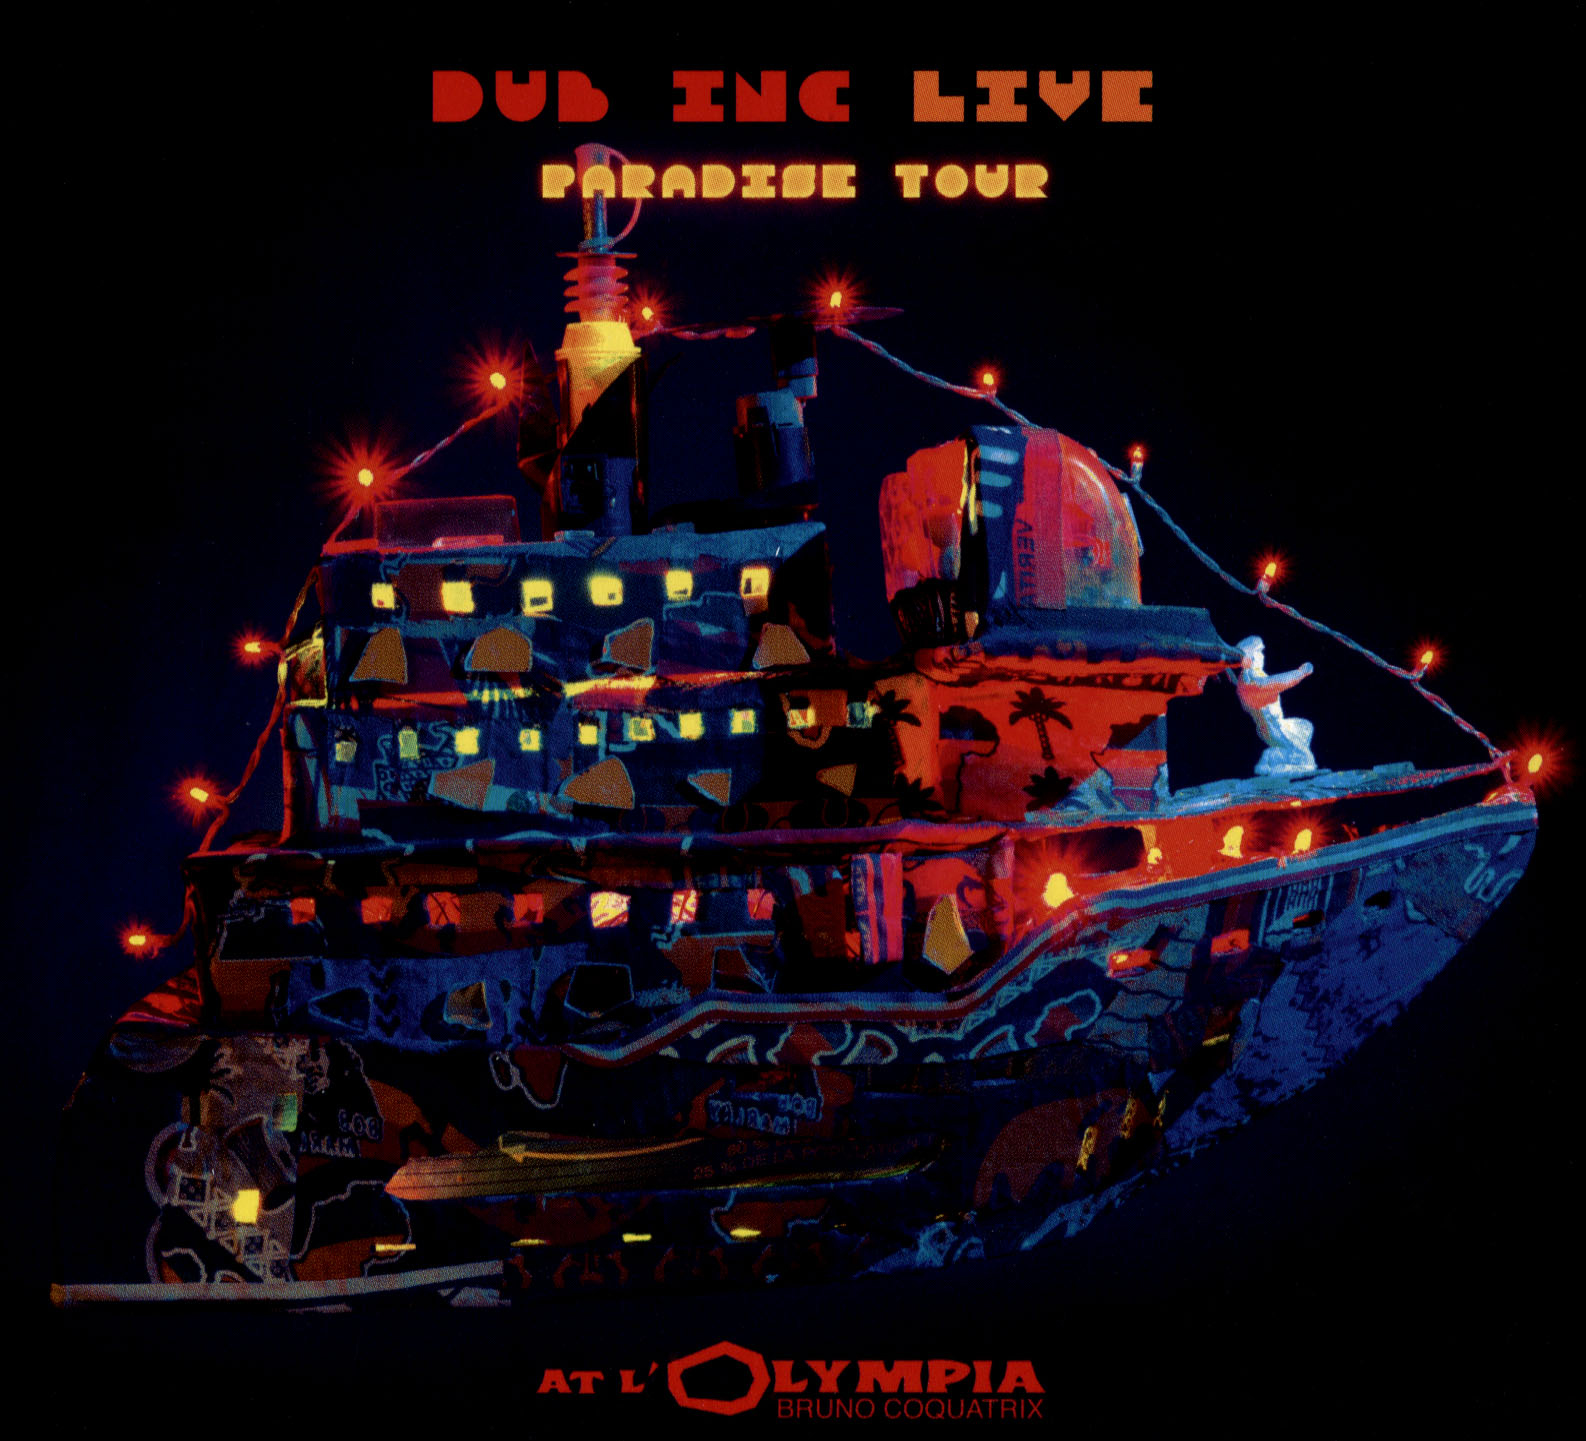 Dub Inc.: Live - Paradise Tour